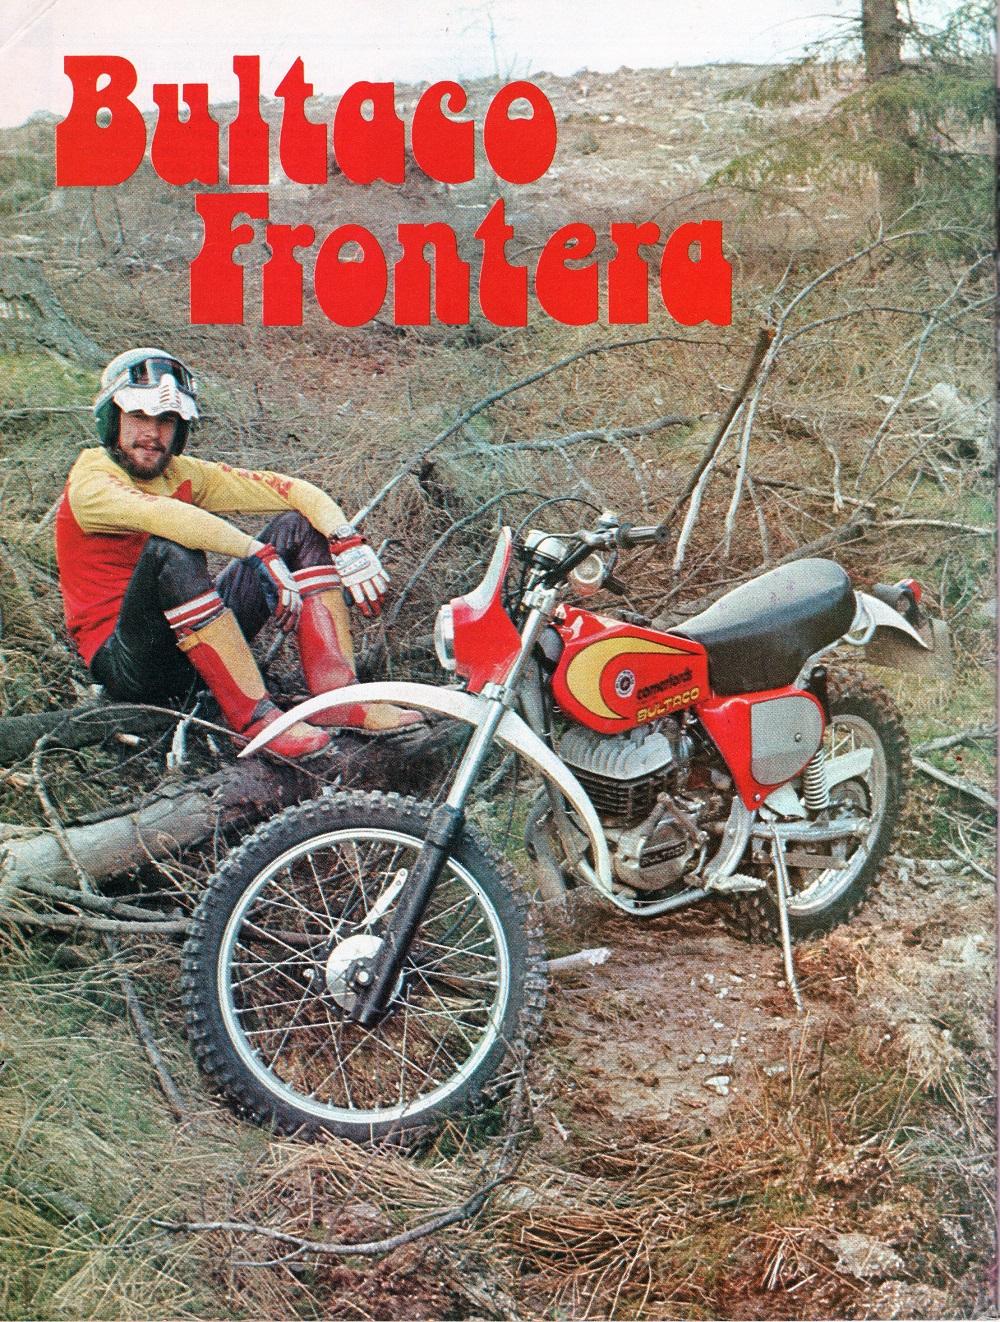 1977 Bultaco 370 Frontera road test.1.jpg